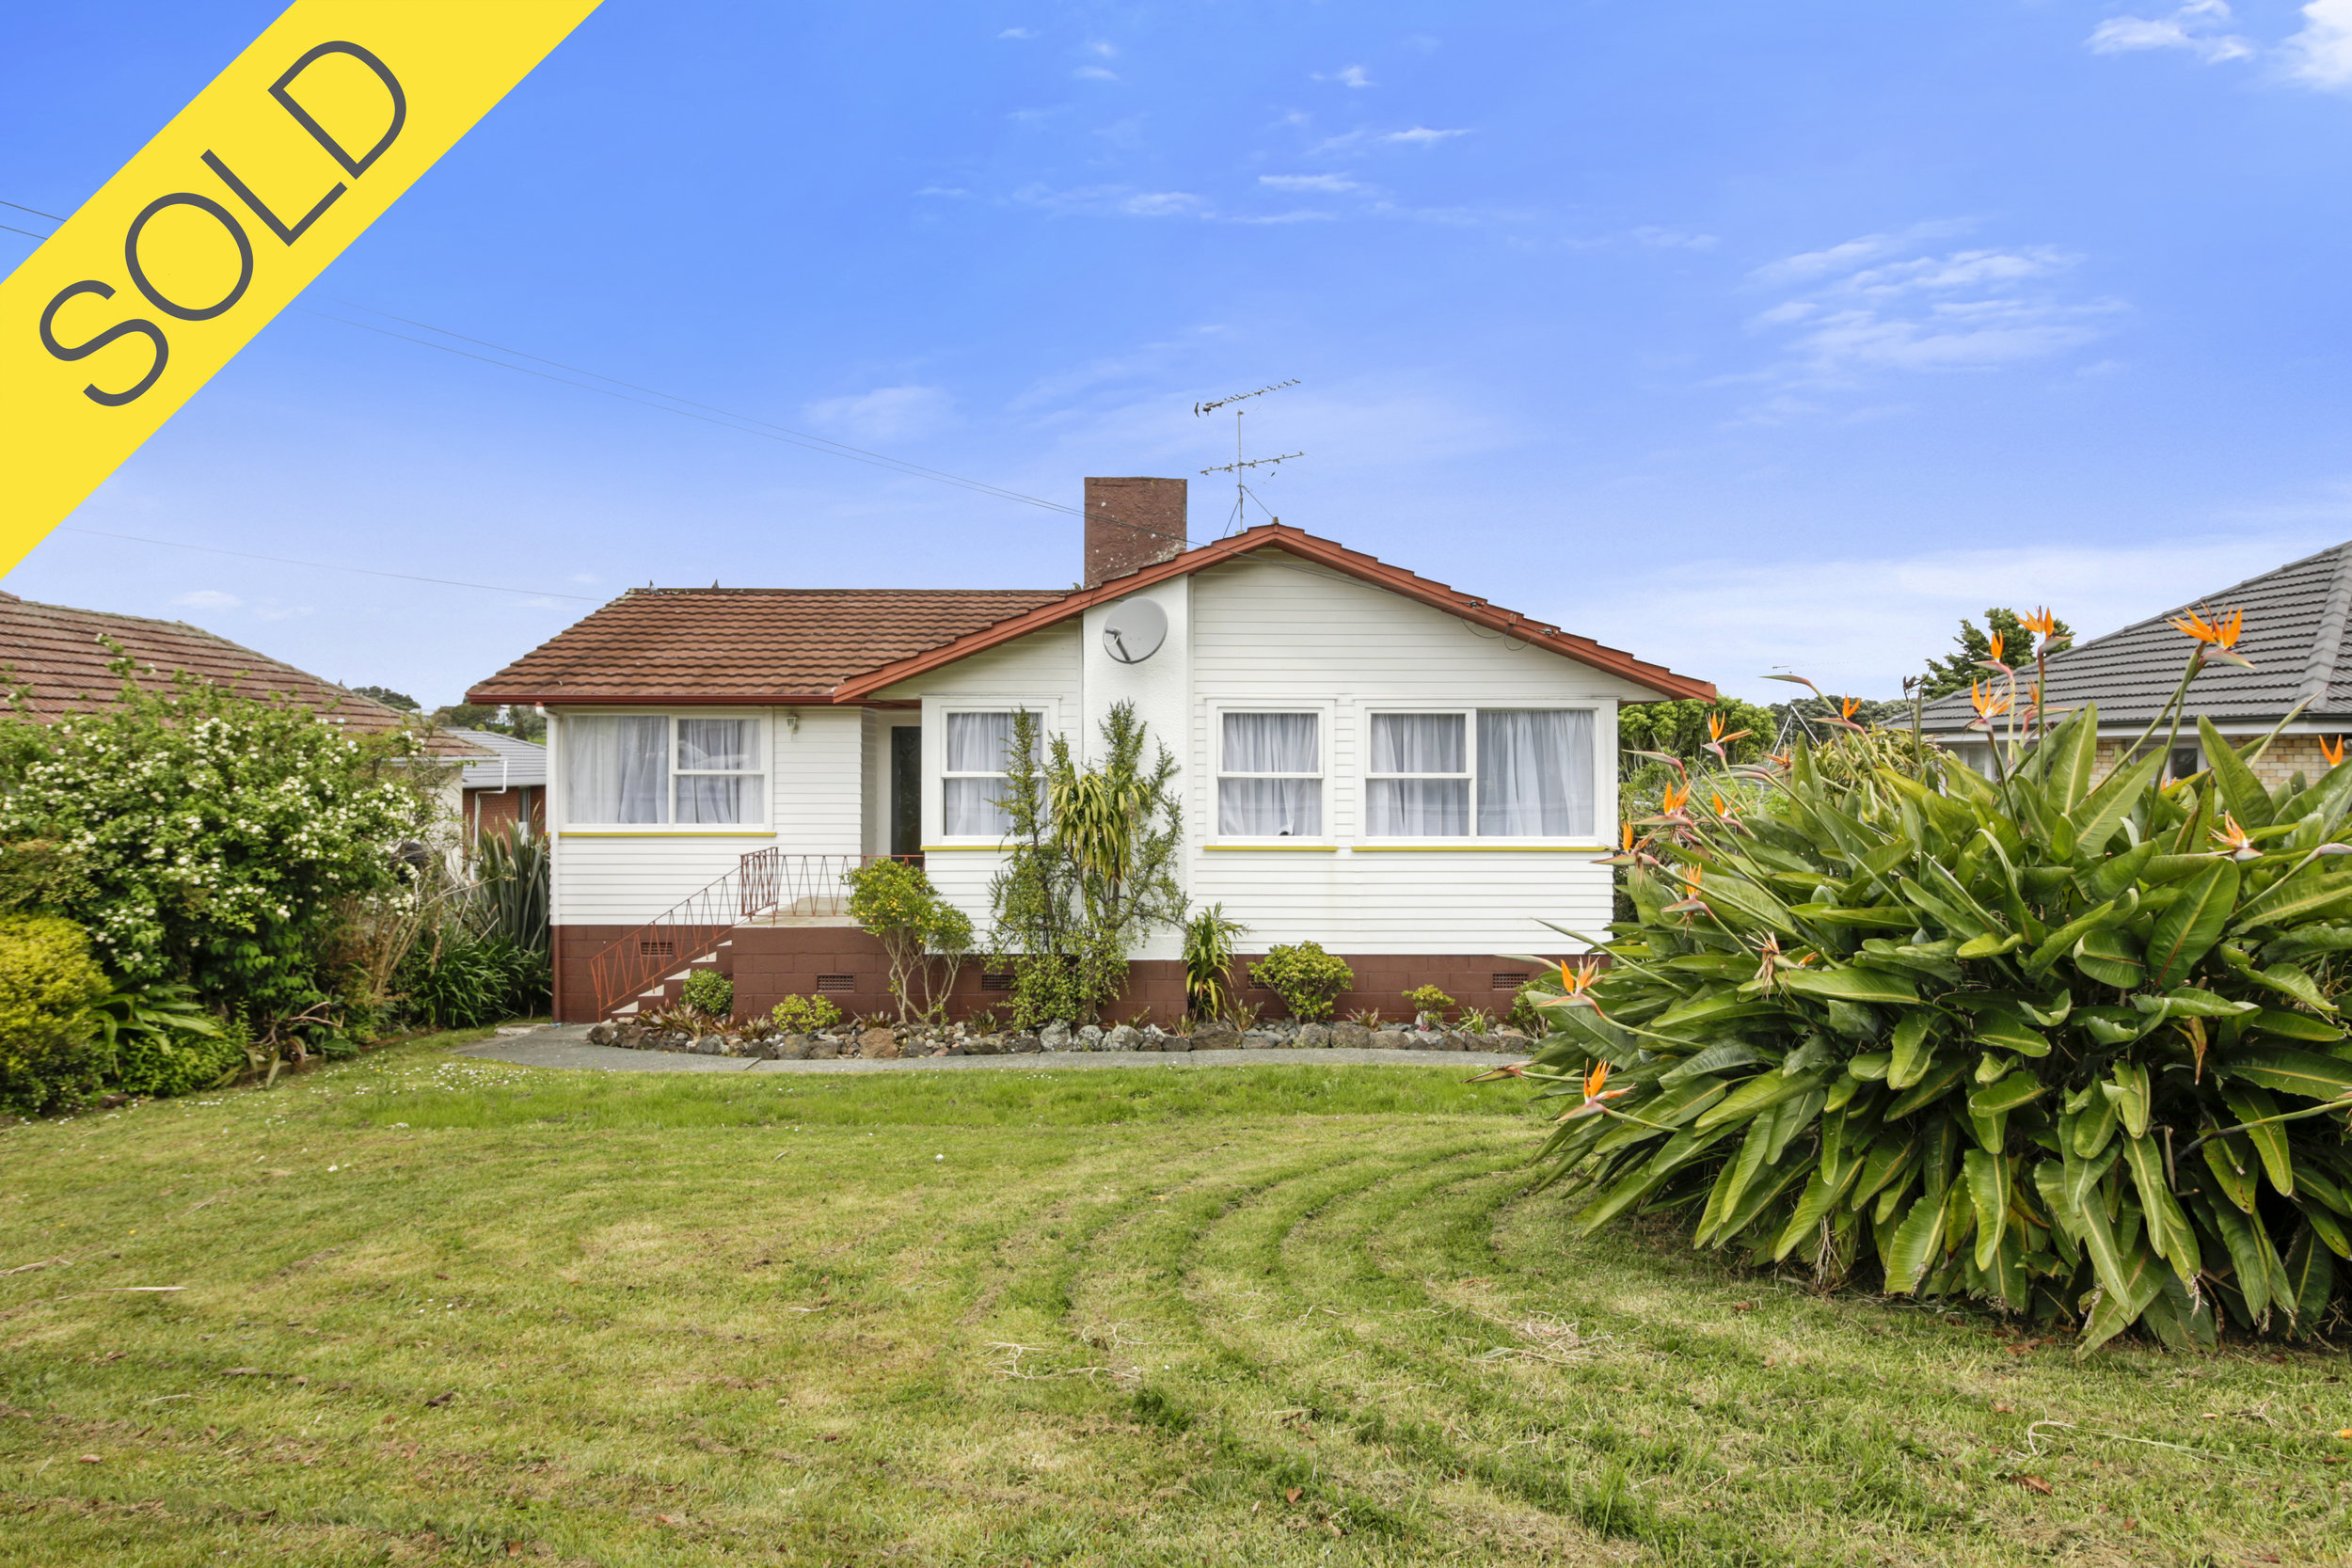 118A Melrose Road, Mt Roskill, Auckland - SOLD DECEMBER 20173 Beds I 1 Bath